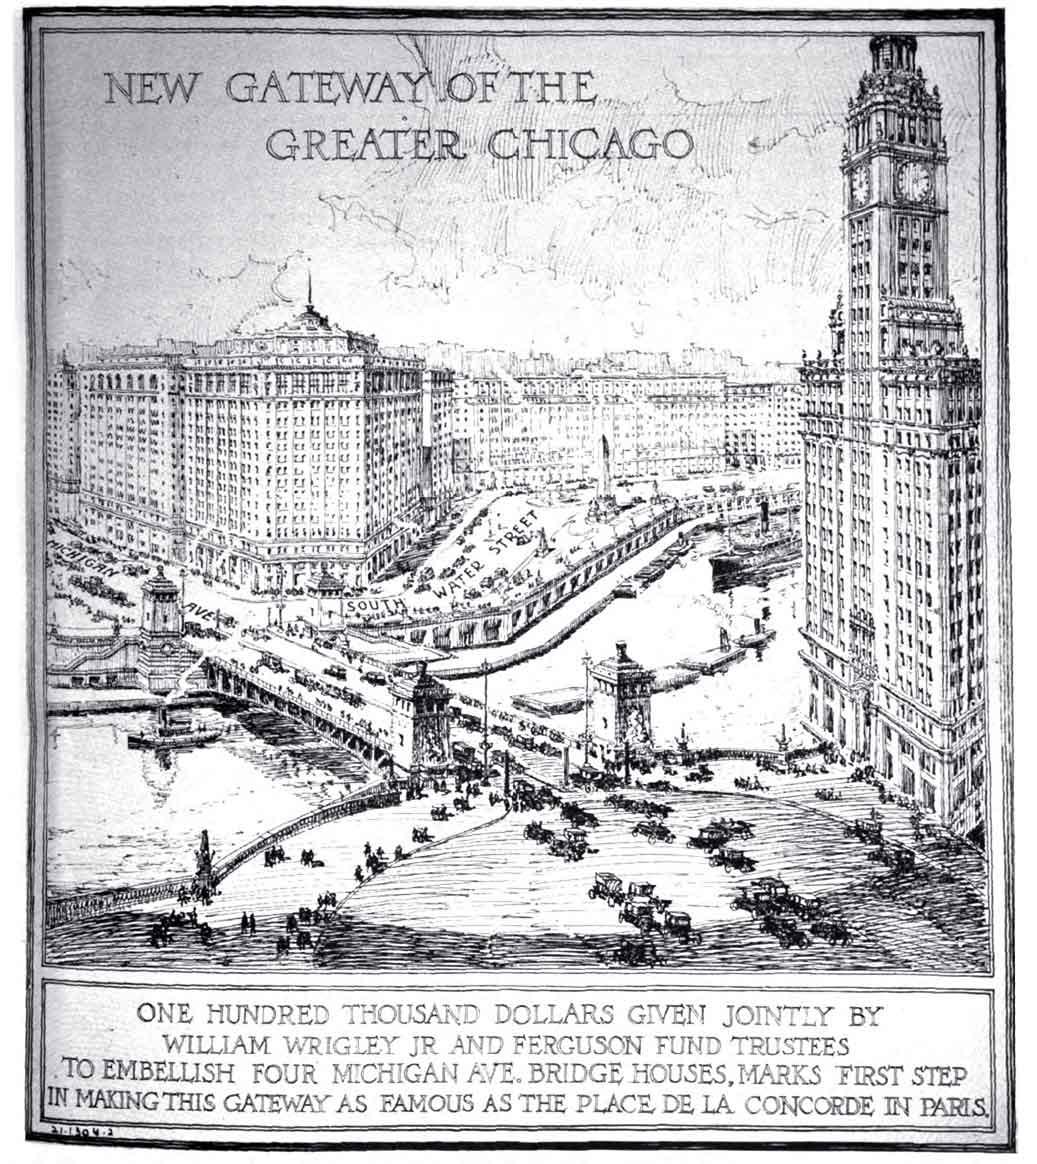 Michigan Avenue Bridge 1922 - New Gateway Center